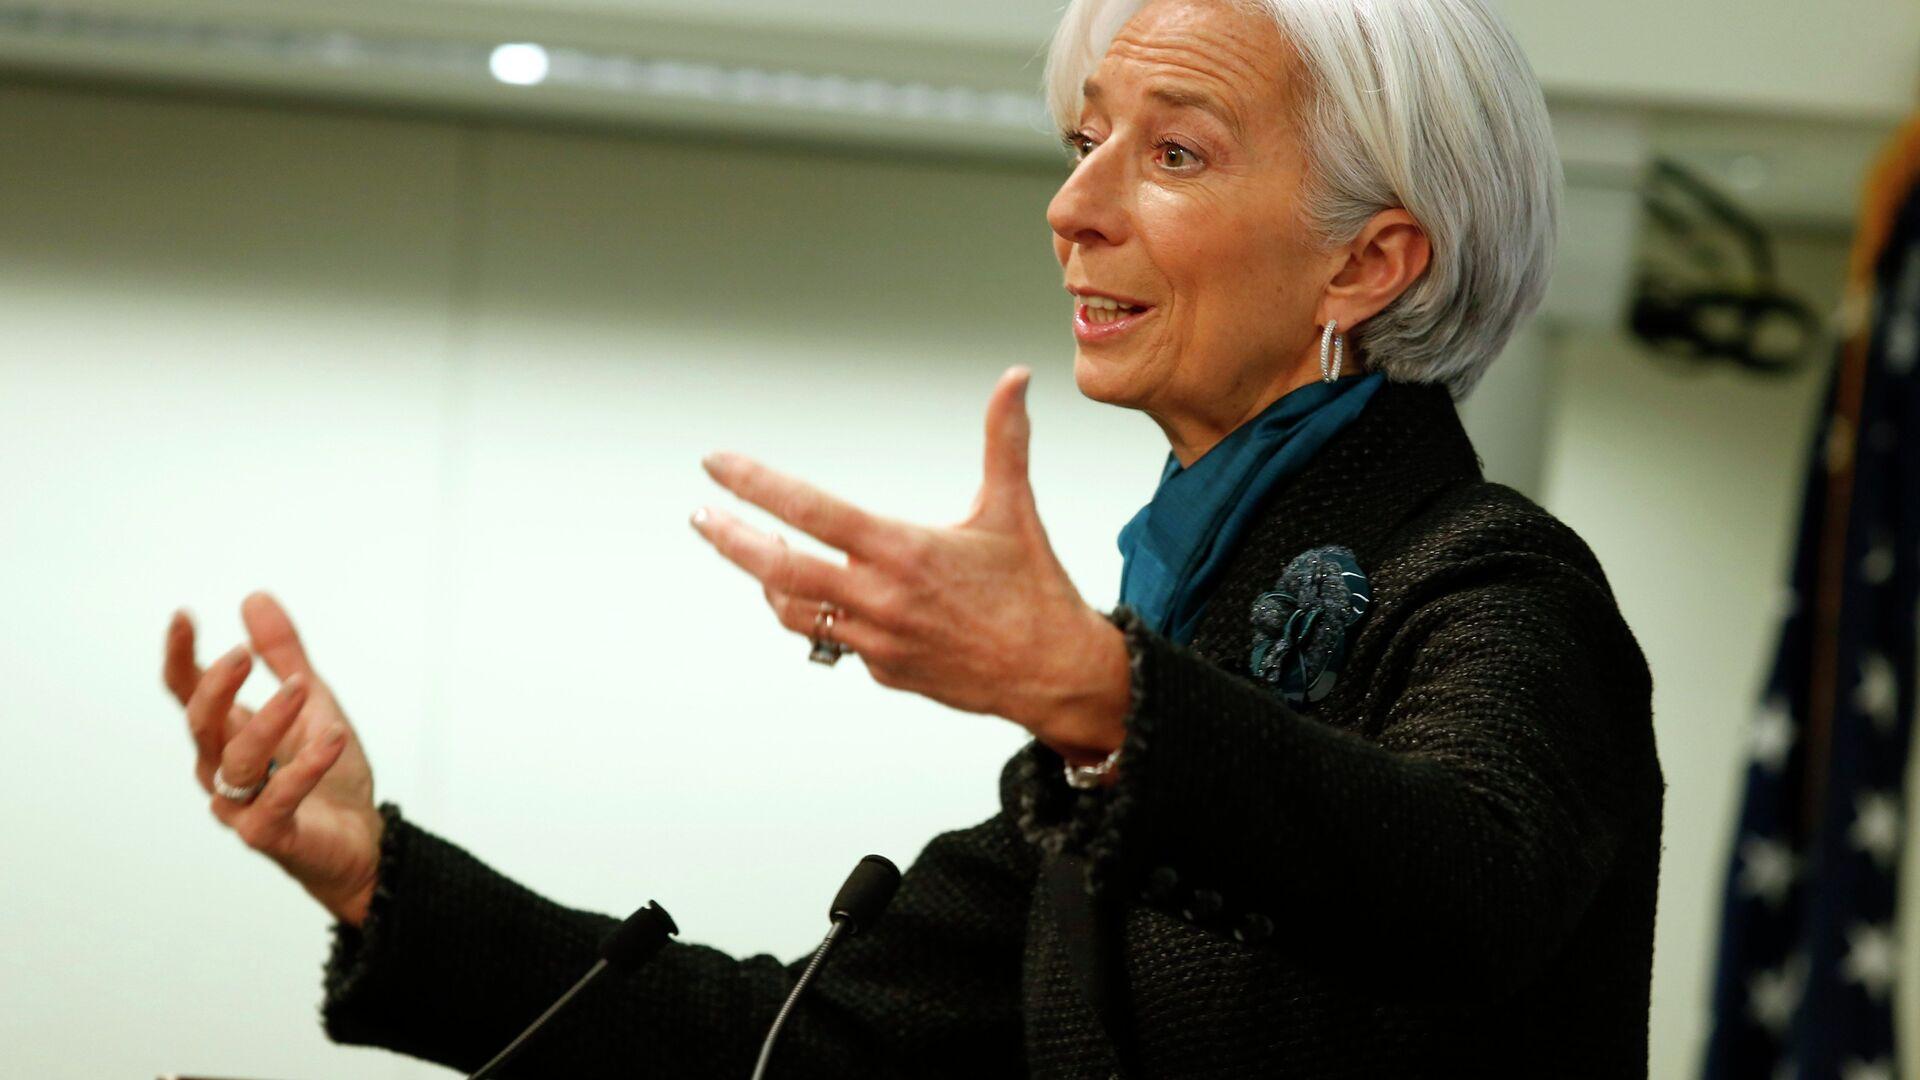 Christine Lagarde, ex direttore Fmi e nuovo presidente Bce - Sputnik Italia, 1920, 07.02.2021